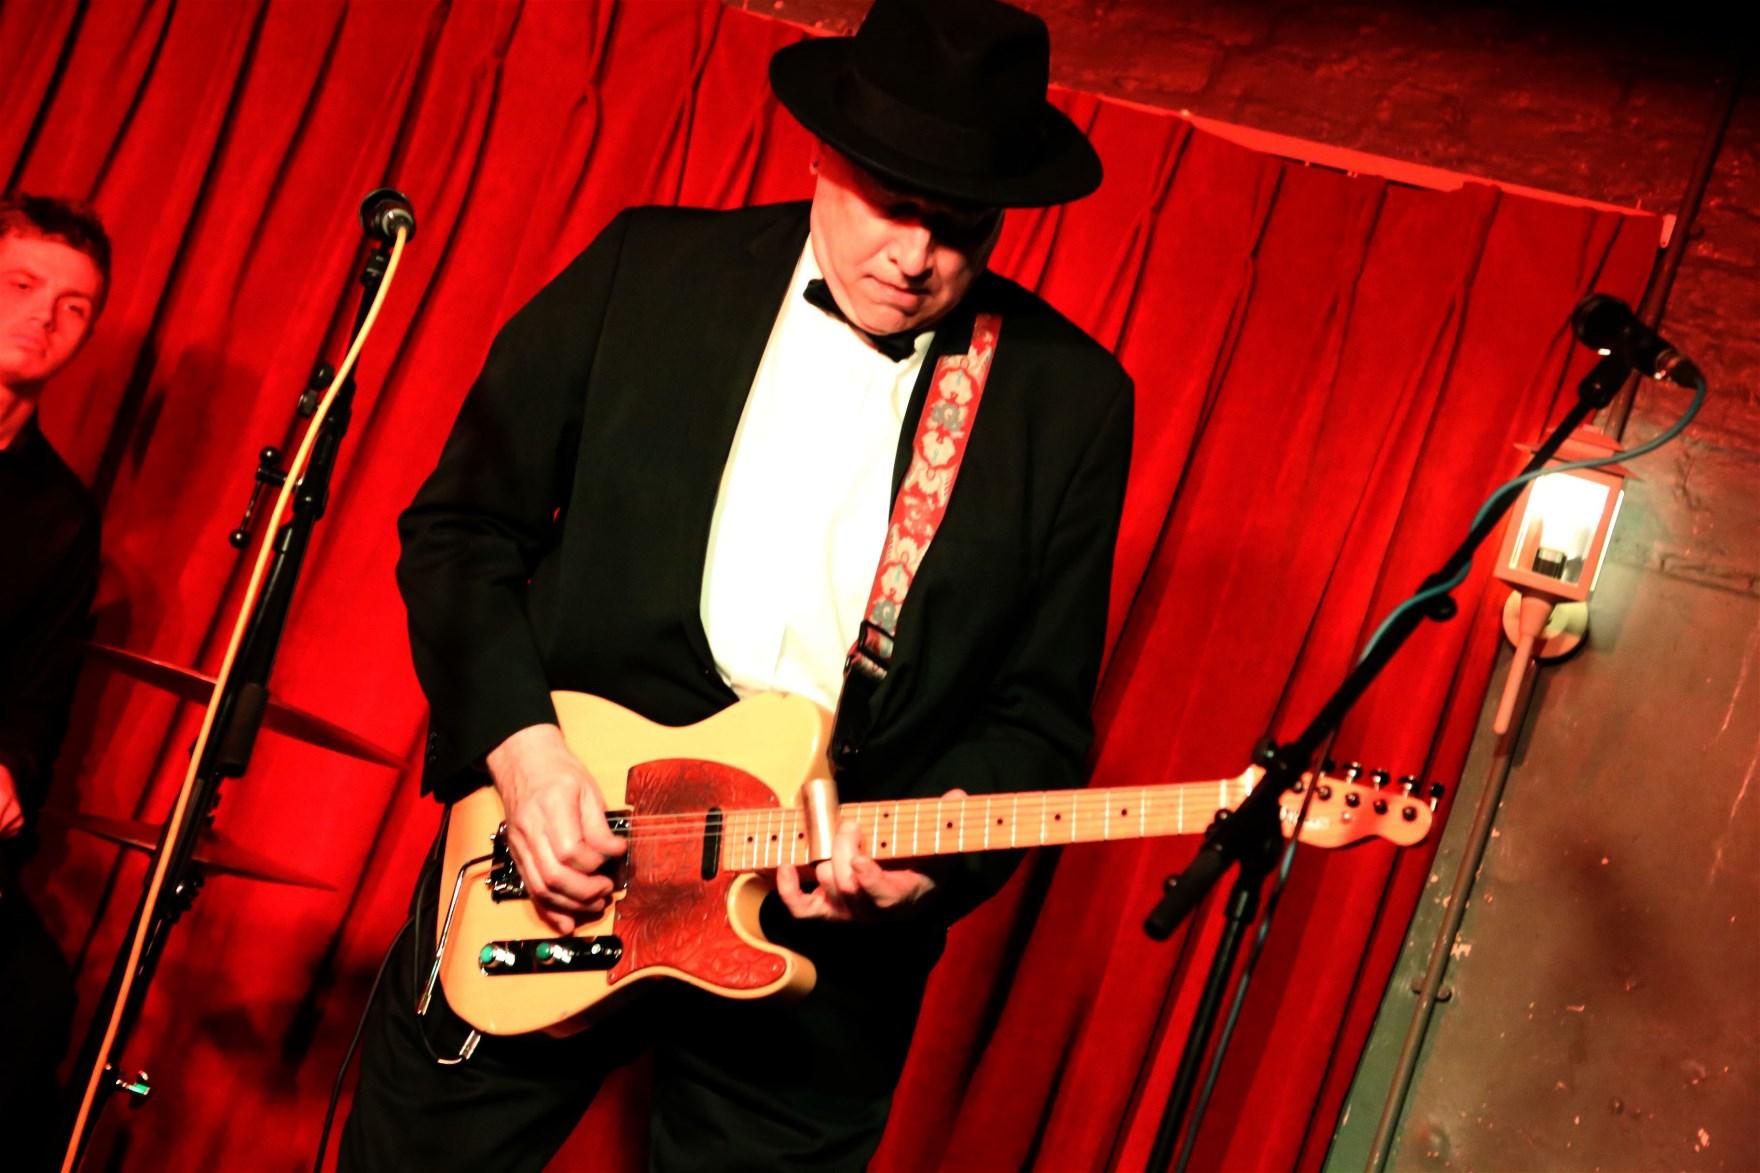 JOE JAMMER'S ALL-STAR CHICAGO BLUES REVUE – London Jazz Festival,